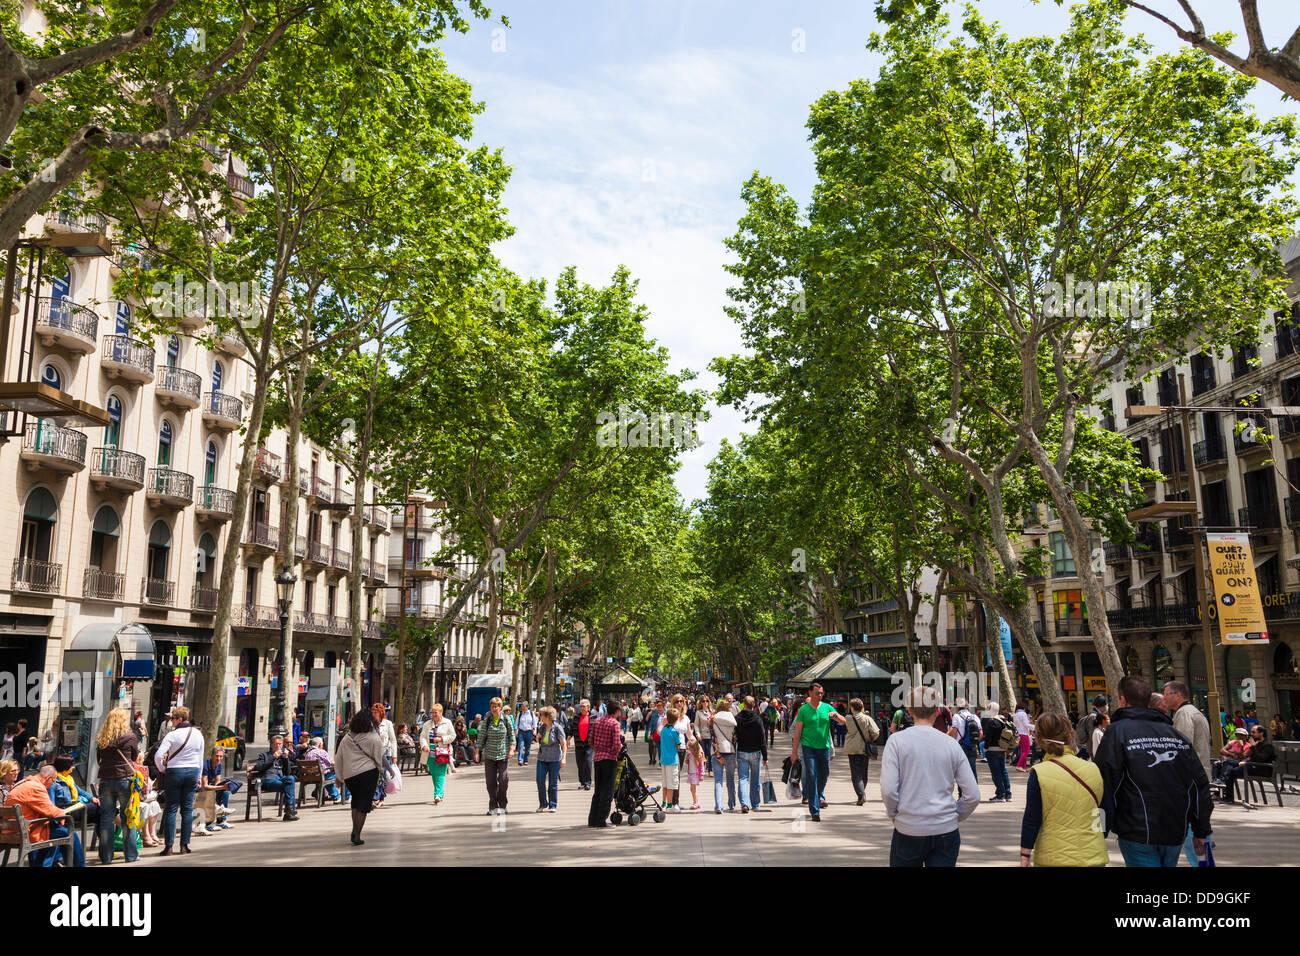 La Rambla pedestrian tourist street in Barcelona - Stock Image